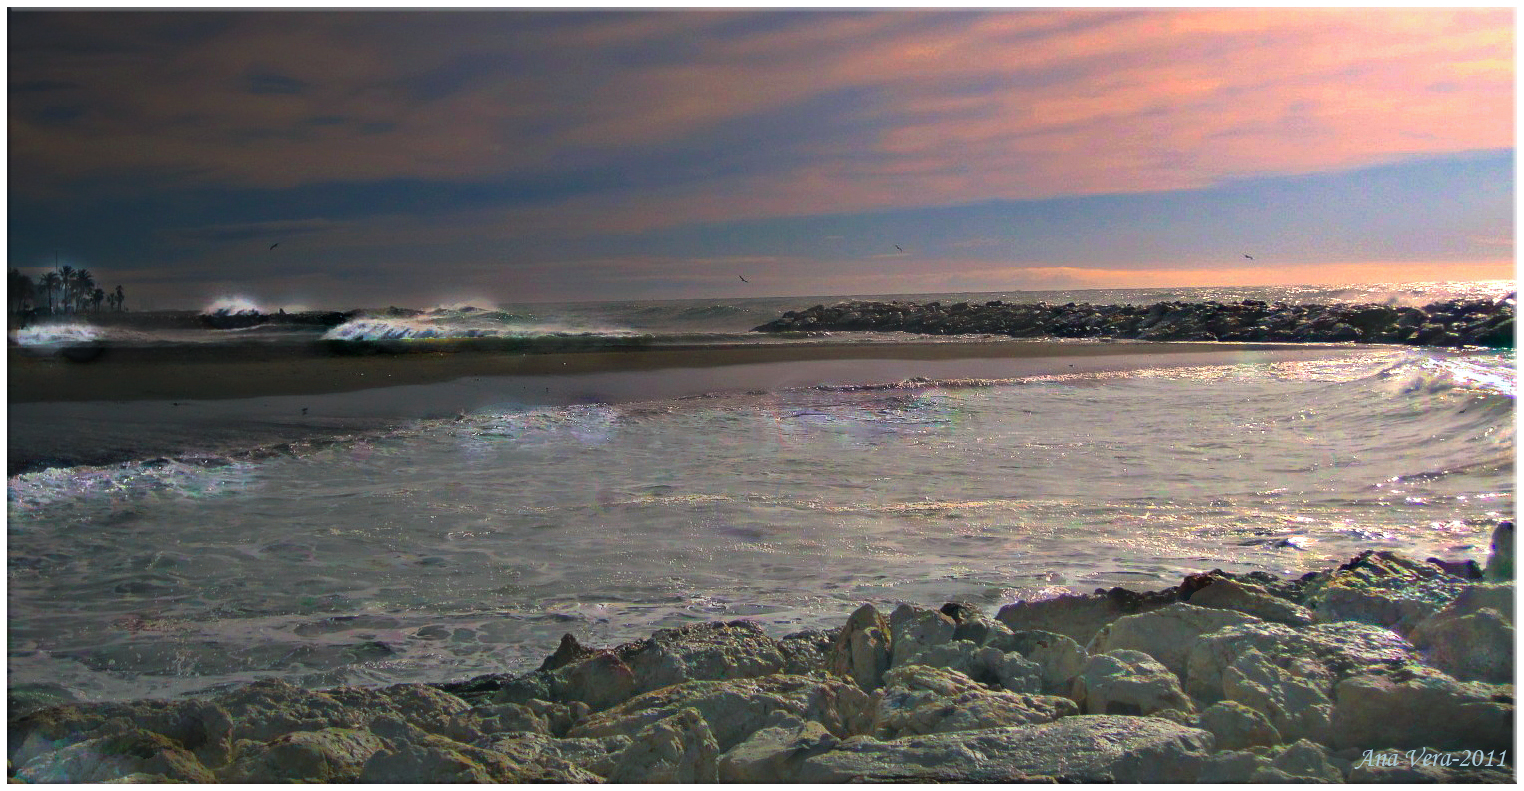 Resbala la luz sobre la playa